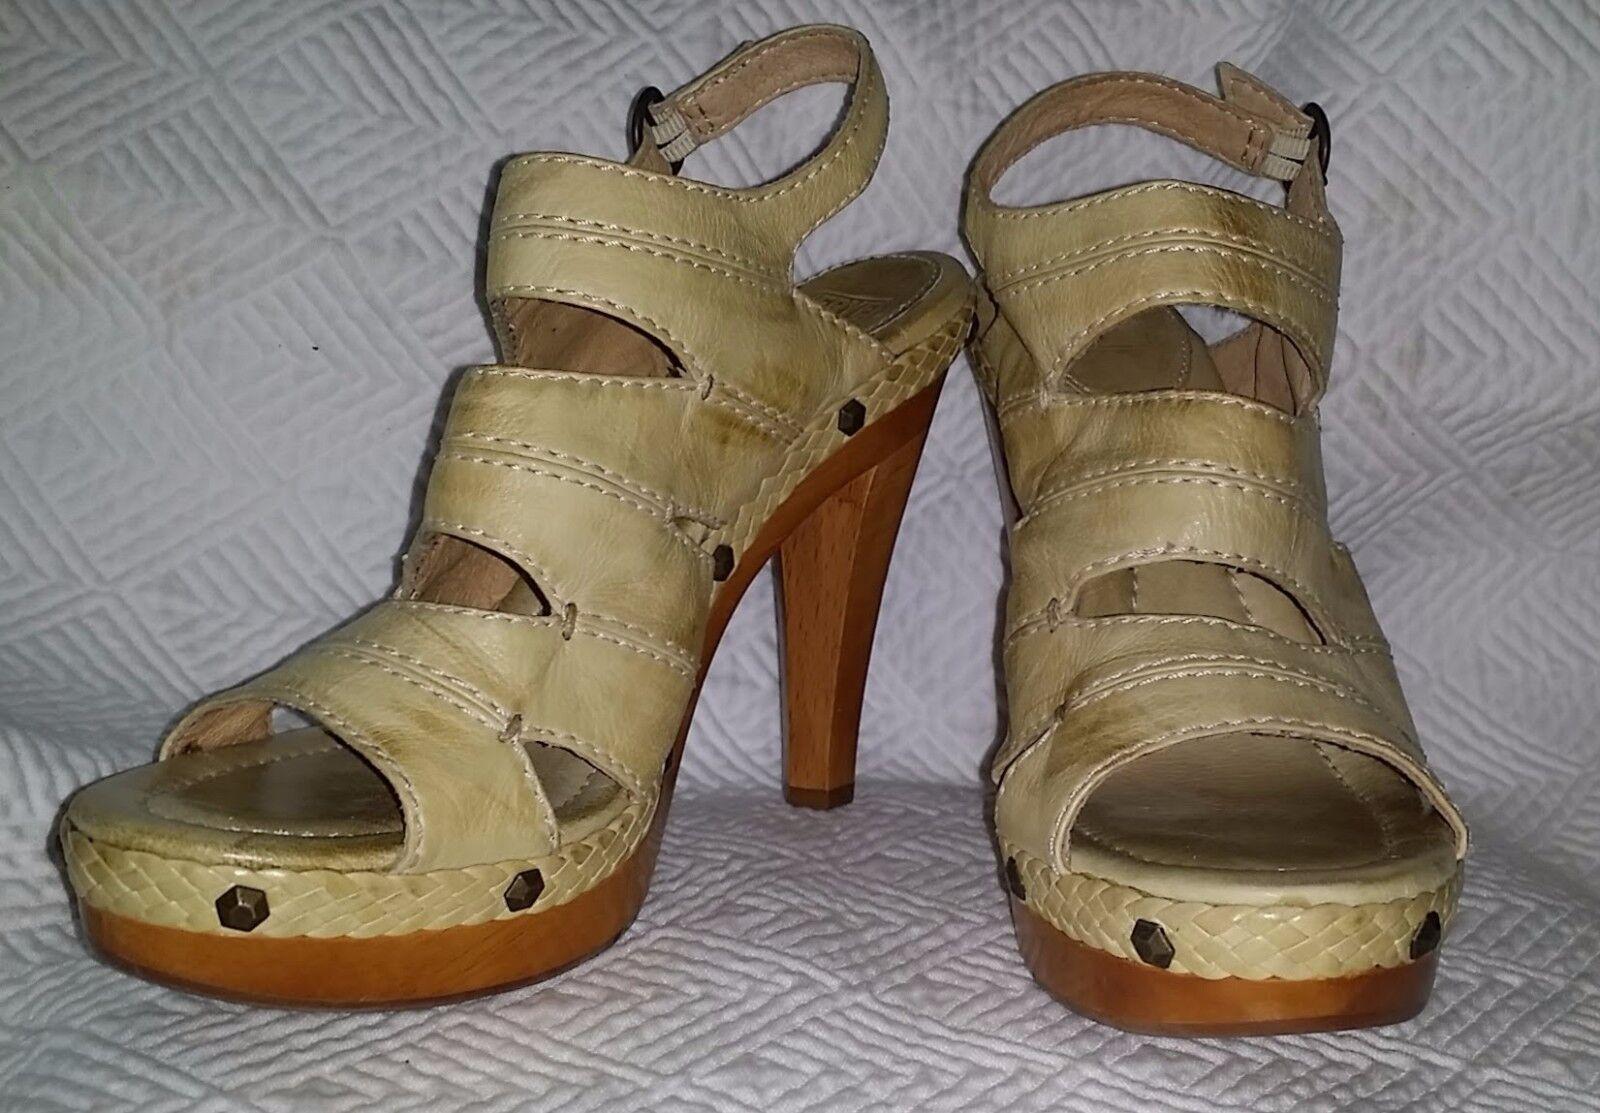 FRYE Dara Campus Stitch US 10 Antiqued Natural Leather talons hauts Sandals UNWORN